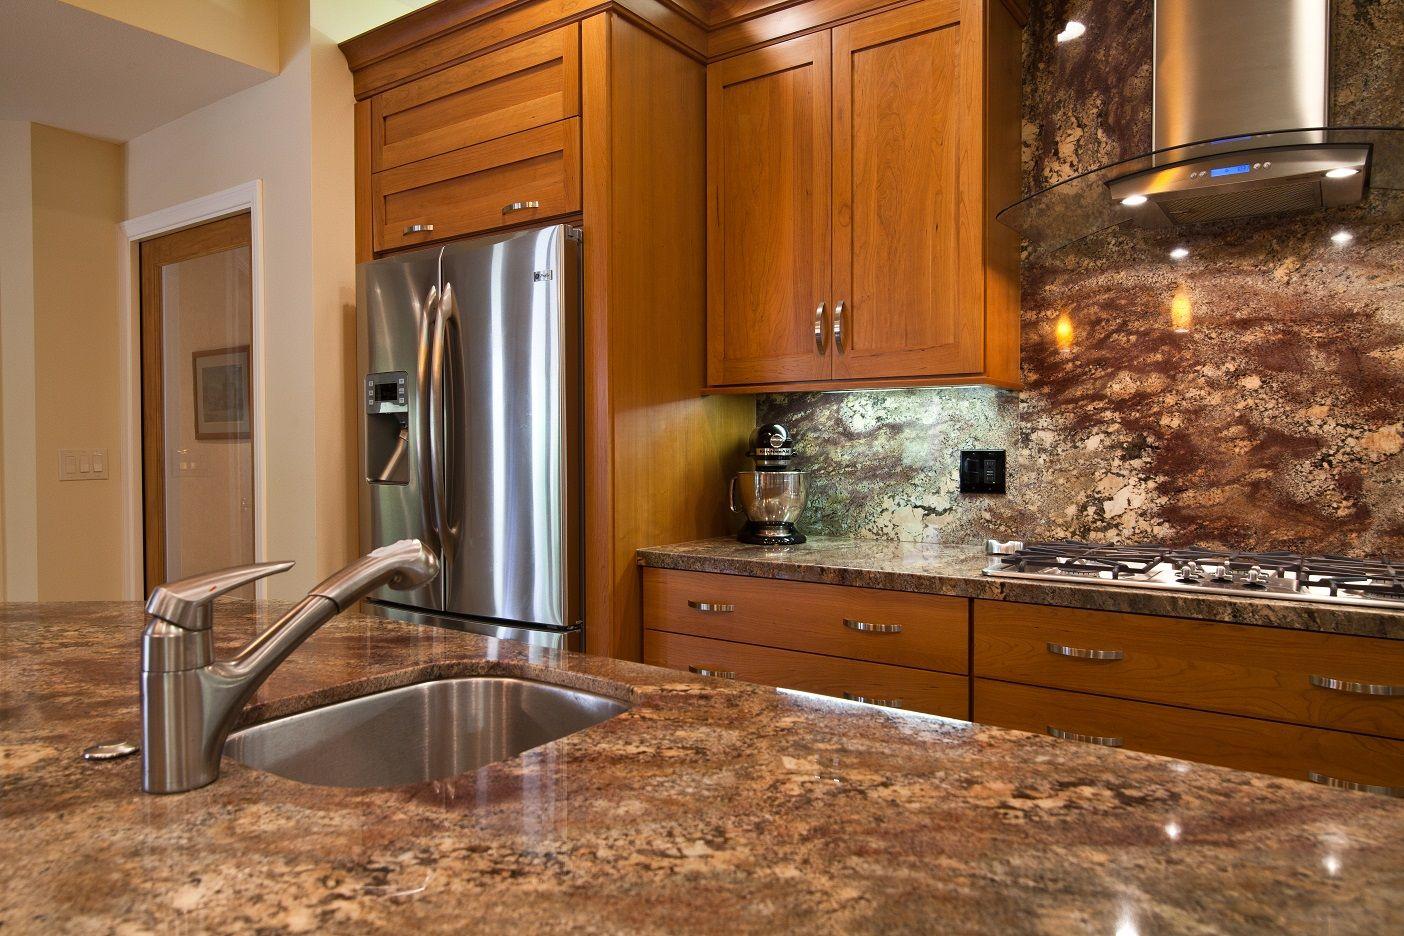 Kitchen Remodel By Kitchens Etc Of Ventura County Www.kitetc.com